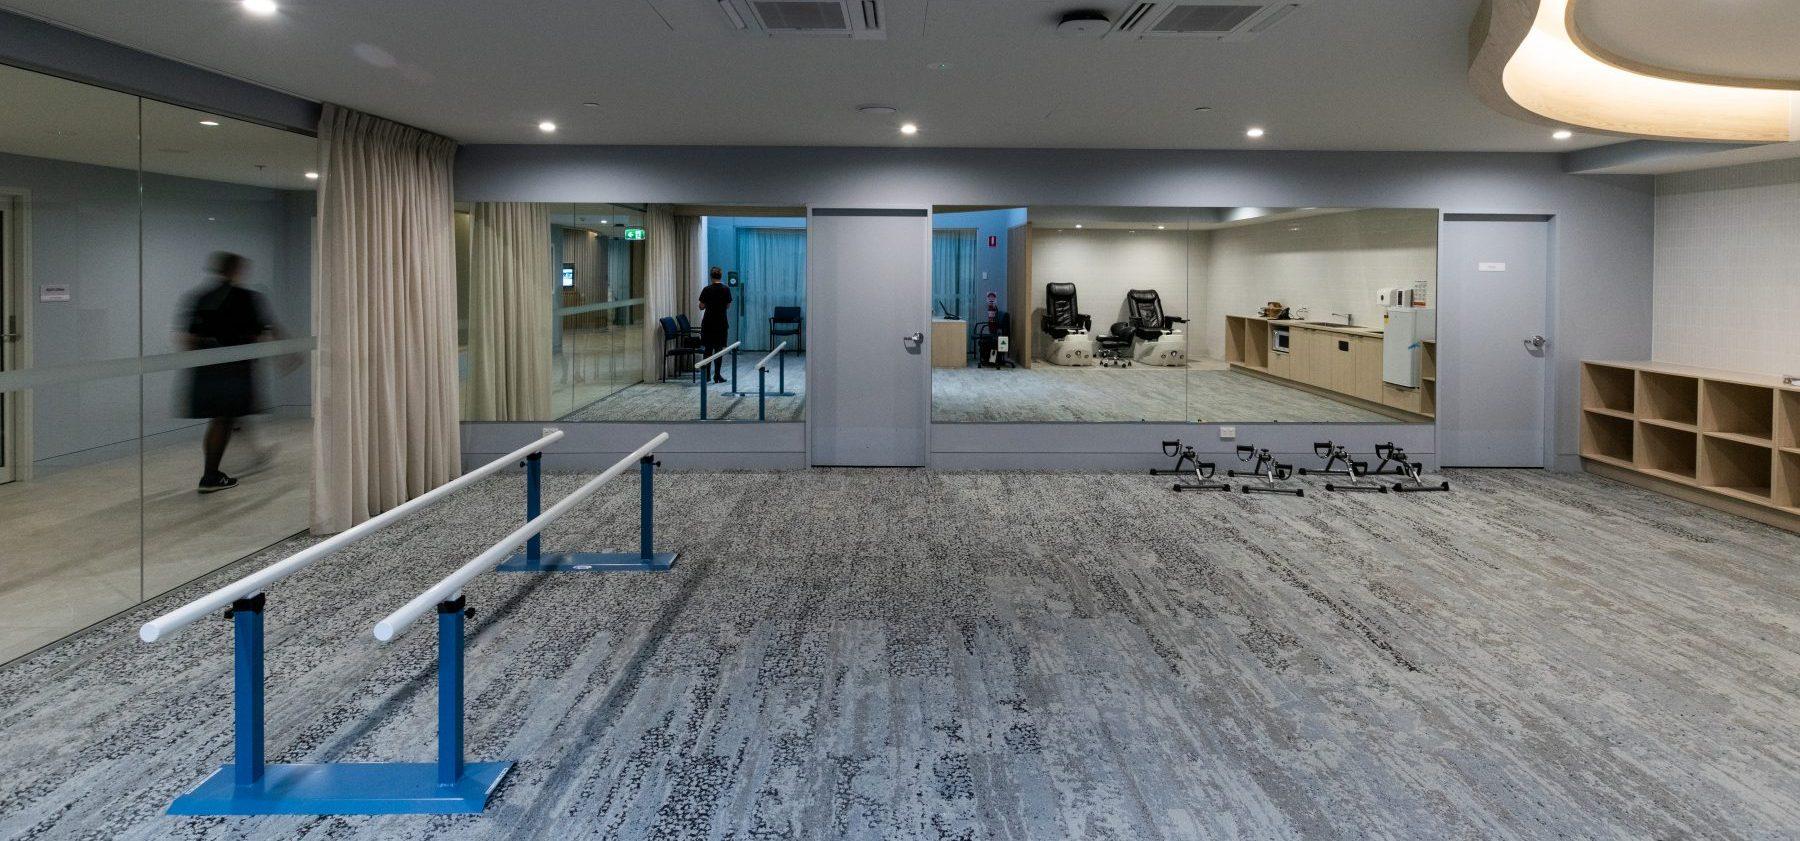 Arcare Noosa Interior PT Room